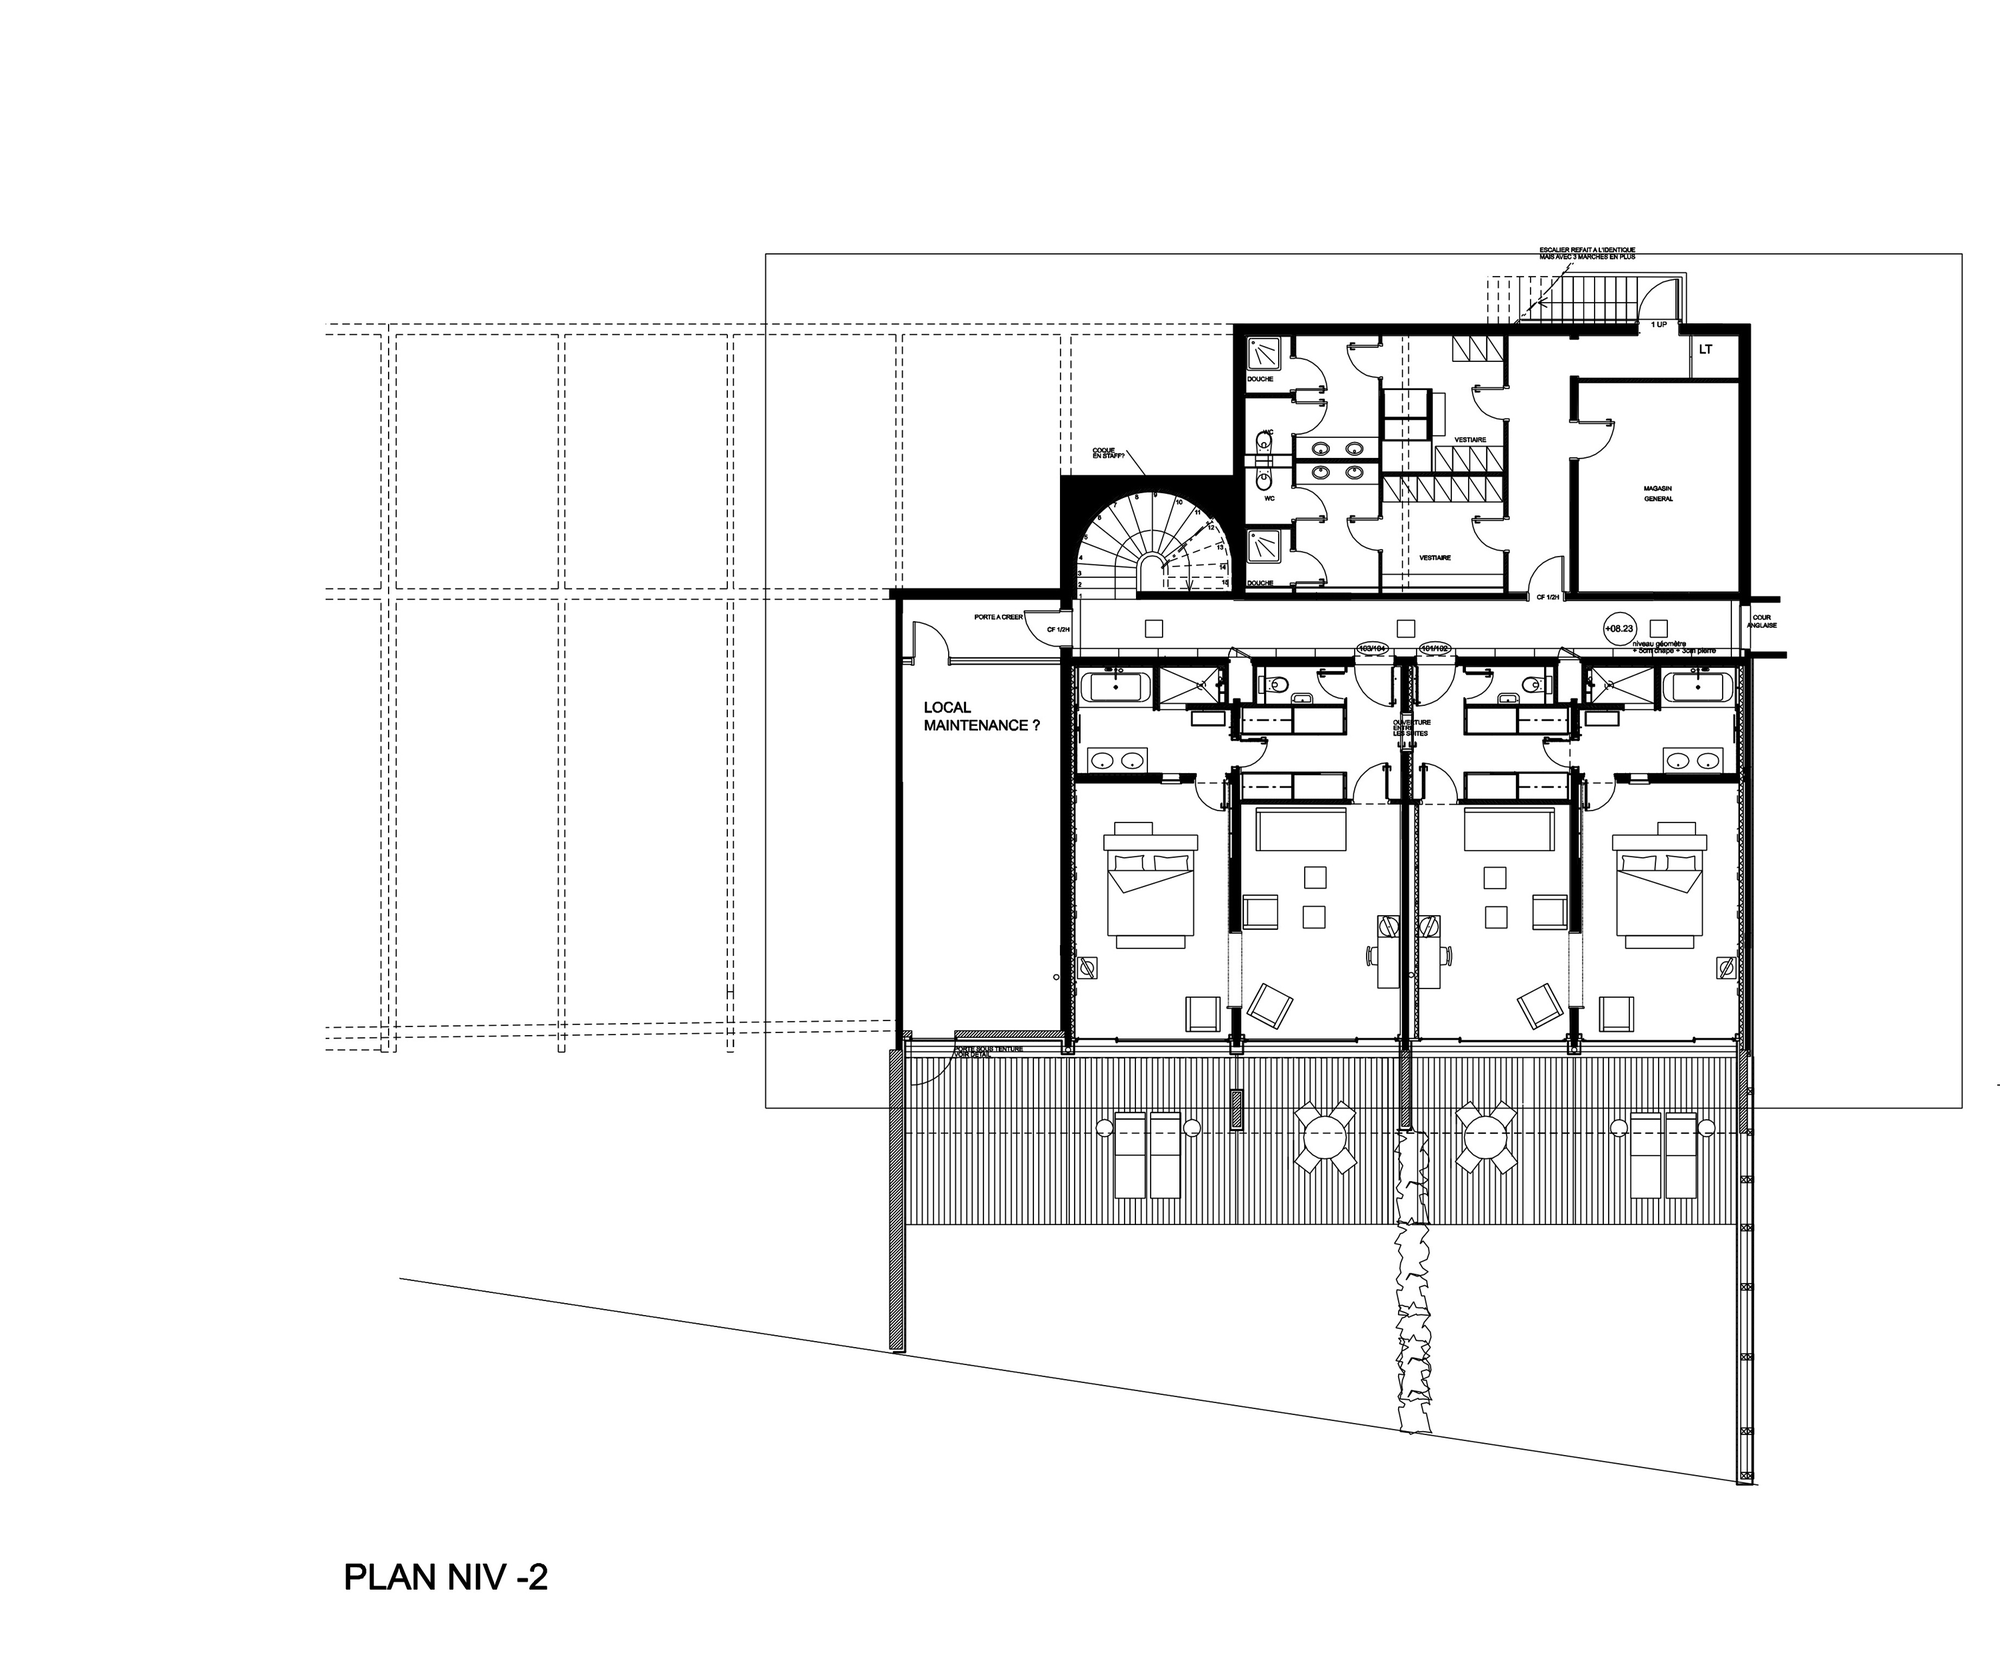 casadelmar-hotel-jean-fran-ois-bodin_plan_100e_-pur-s03